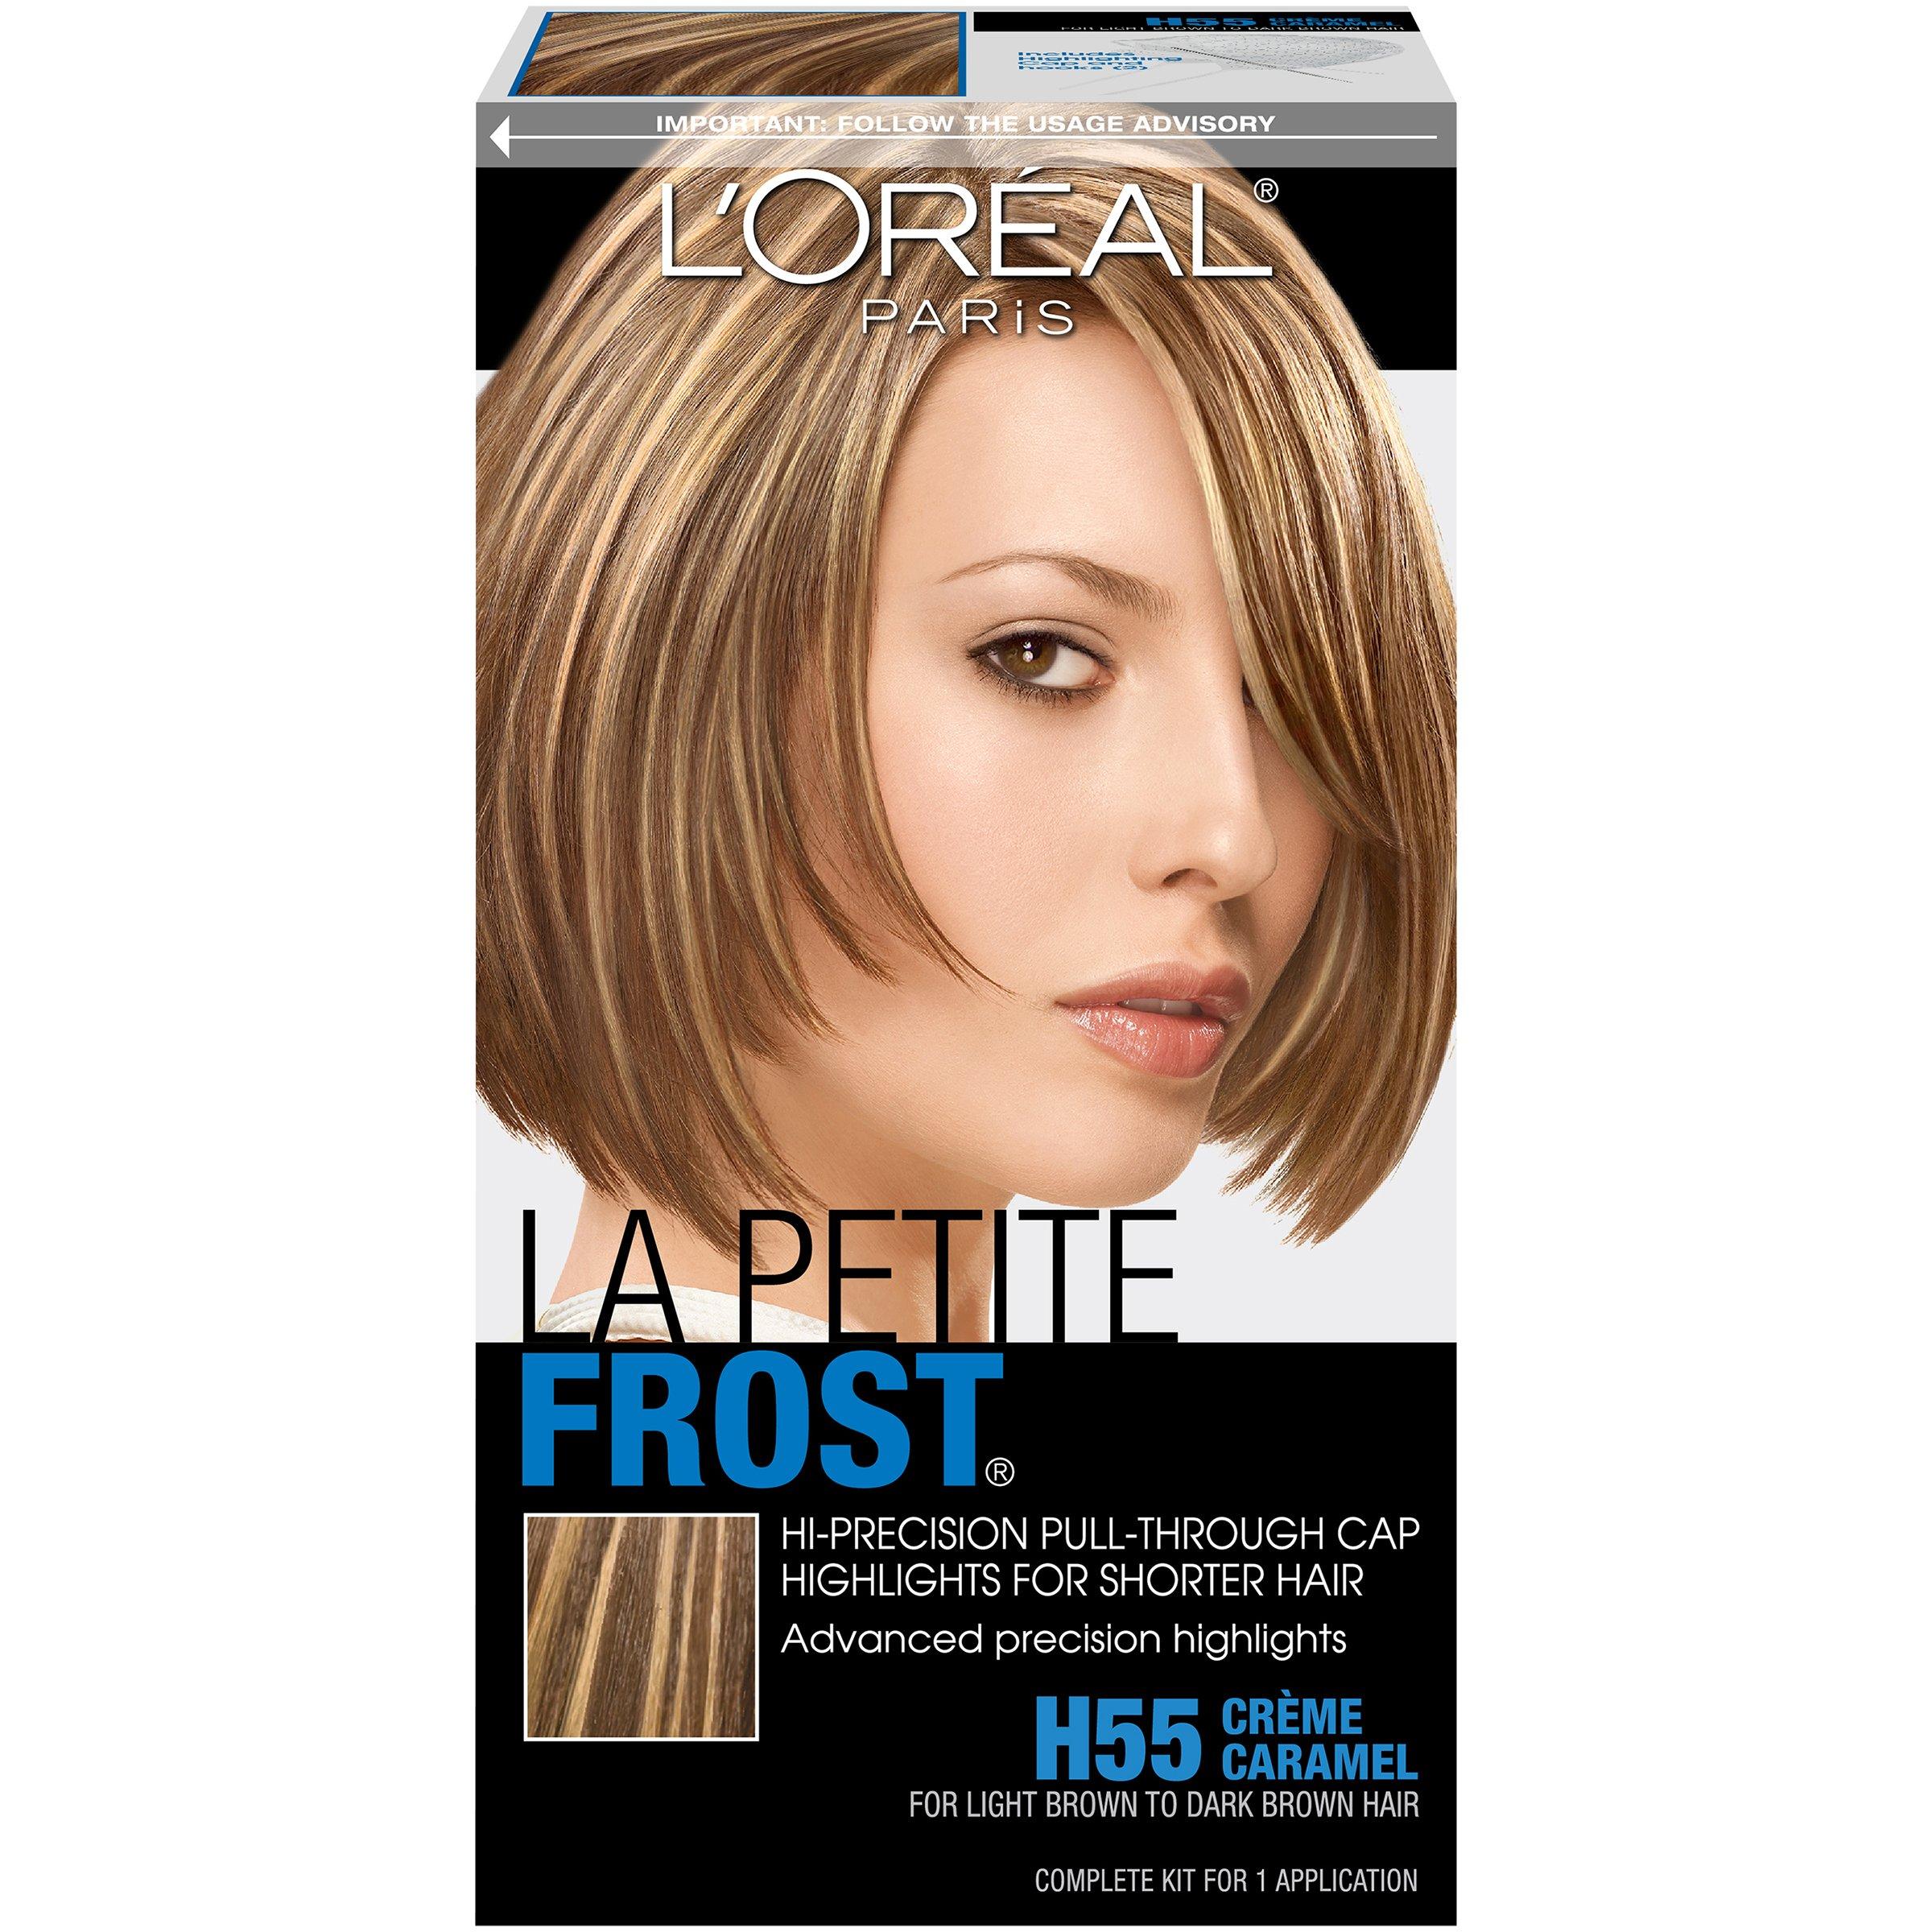 Amazon Loral Paris Le Petite Frost Cap Hair Highlights For